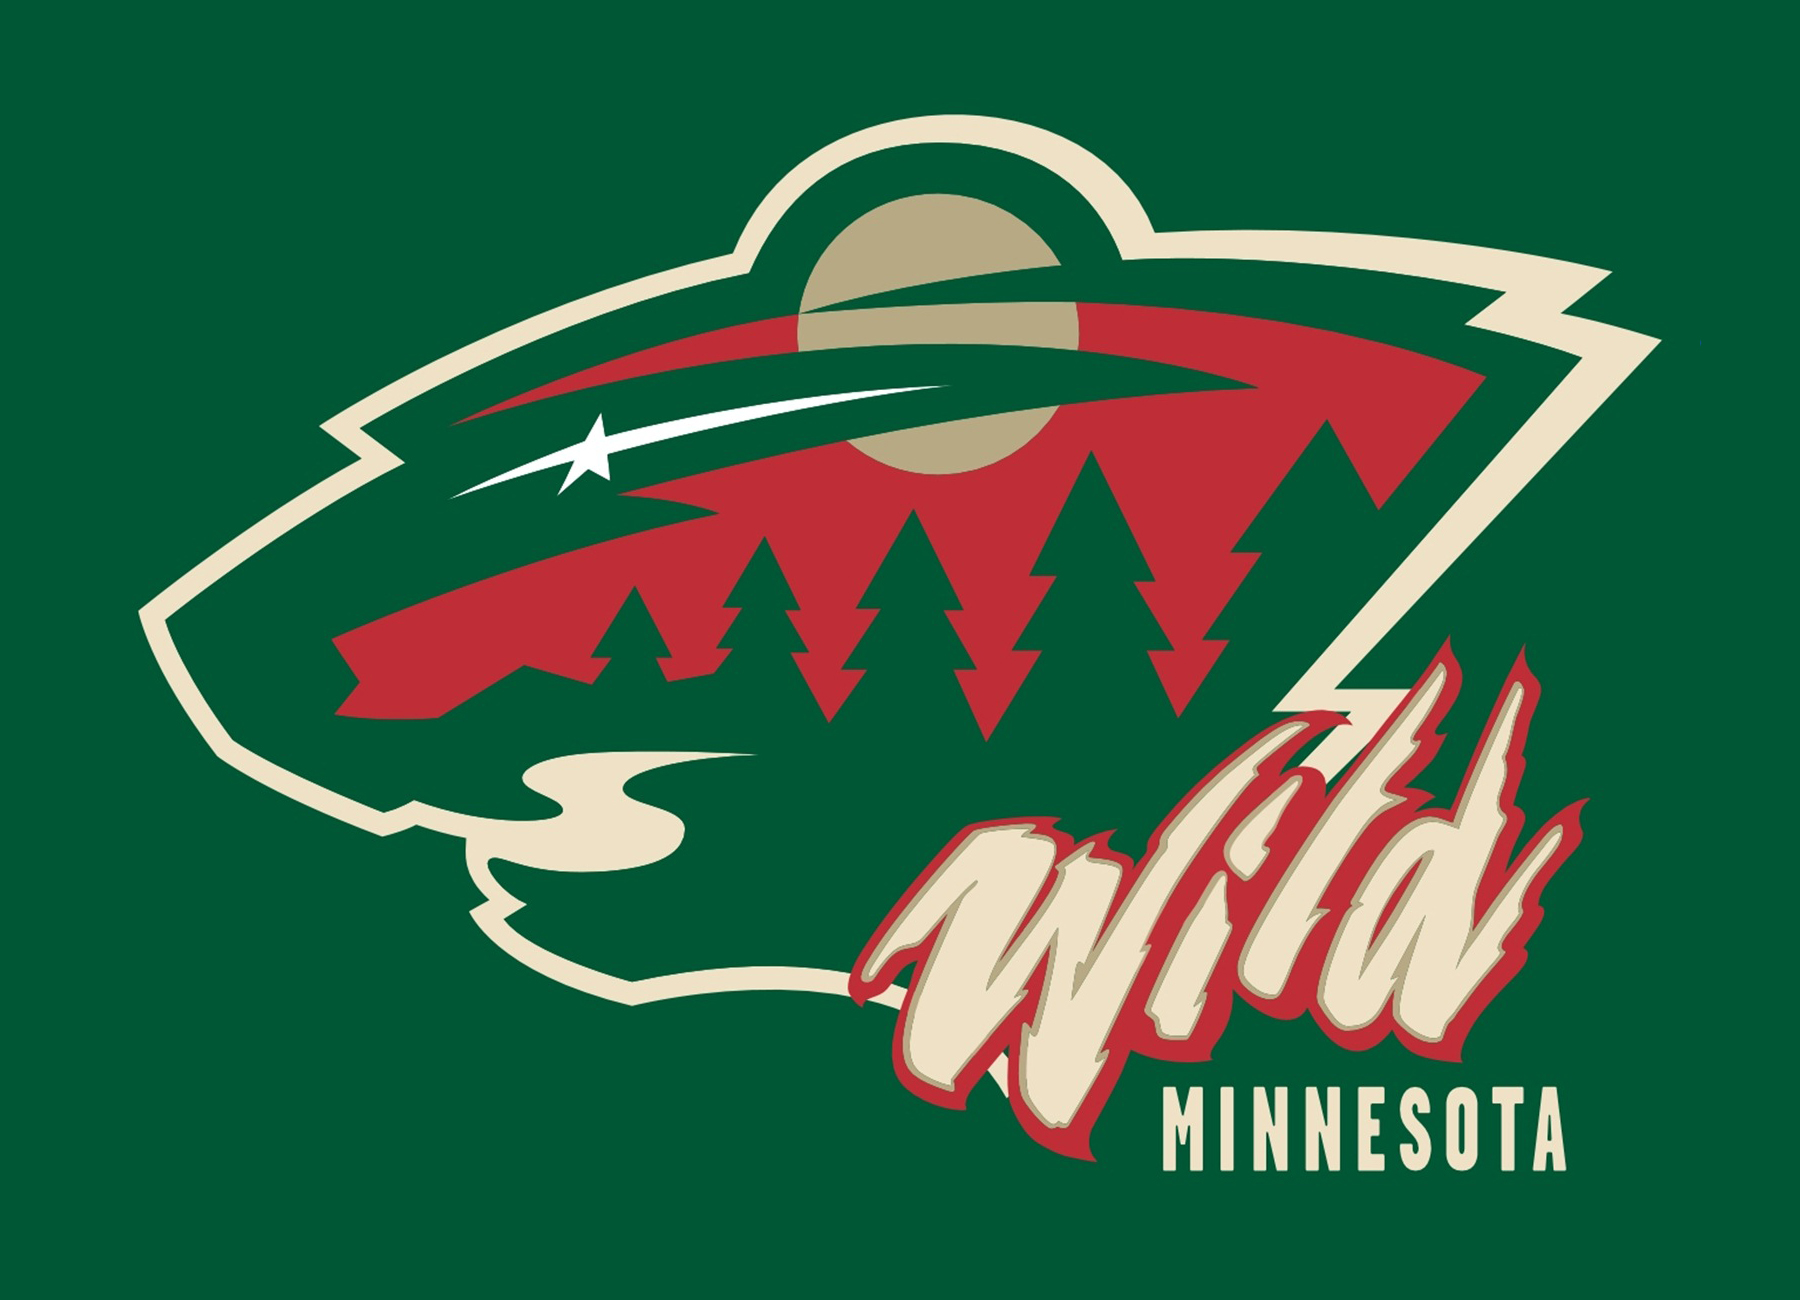 Minnesota Wild Logo Symbol Meaning